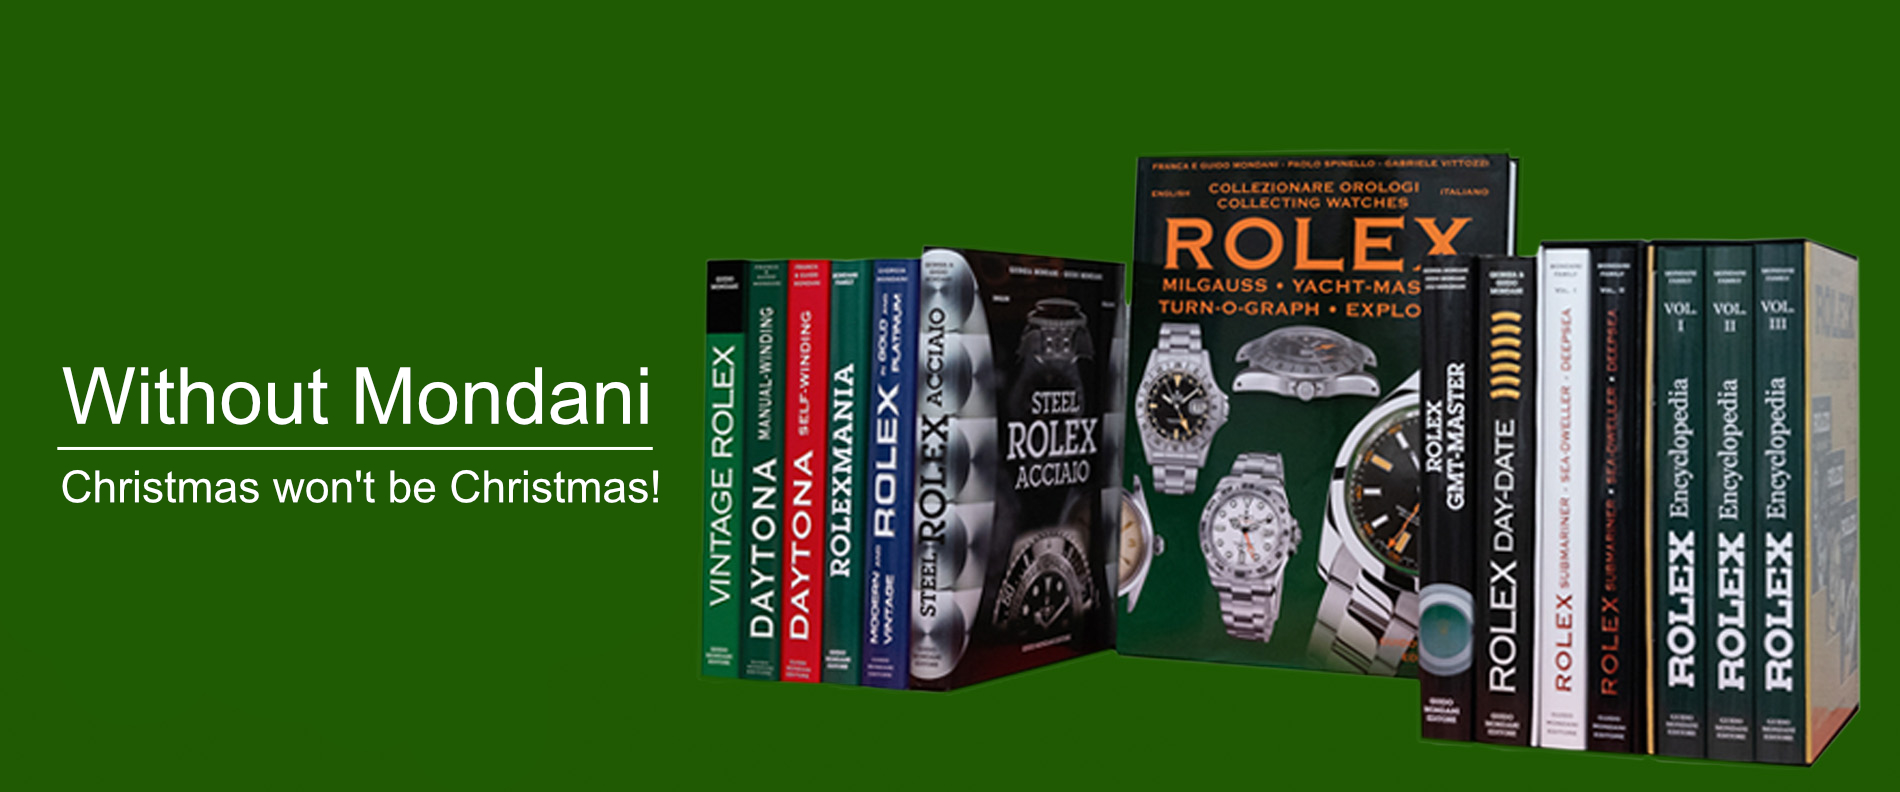 Early Chrstmas - Natale anticipato - Mondani Books - Libri Mondani - Rolex - Patek Philippe